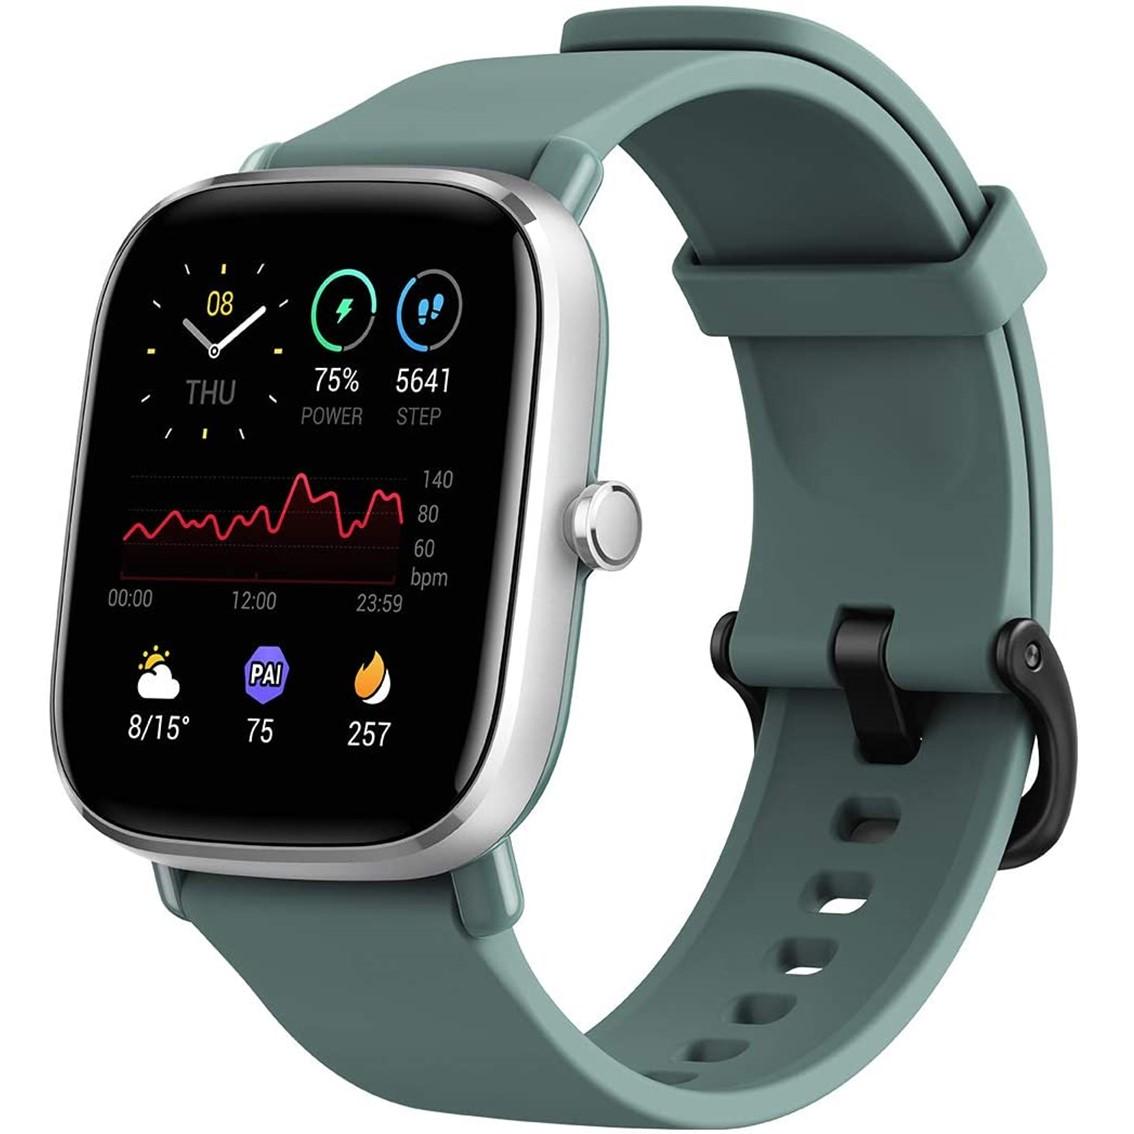 Pulsera reloj deportiva amazfit gts 2 mini sage green -  smartwatch -  1.55pulgadas amoled -   resistente al agua 5 atm